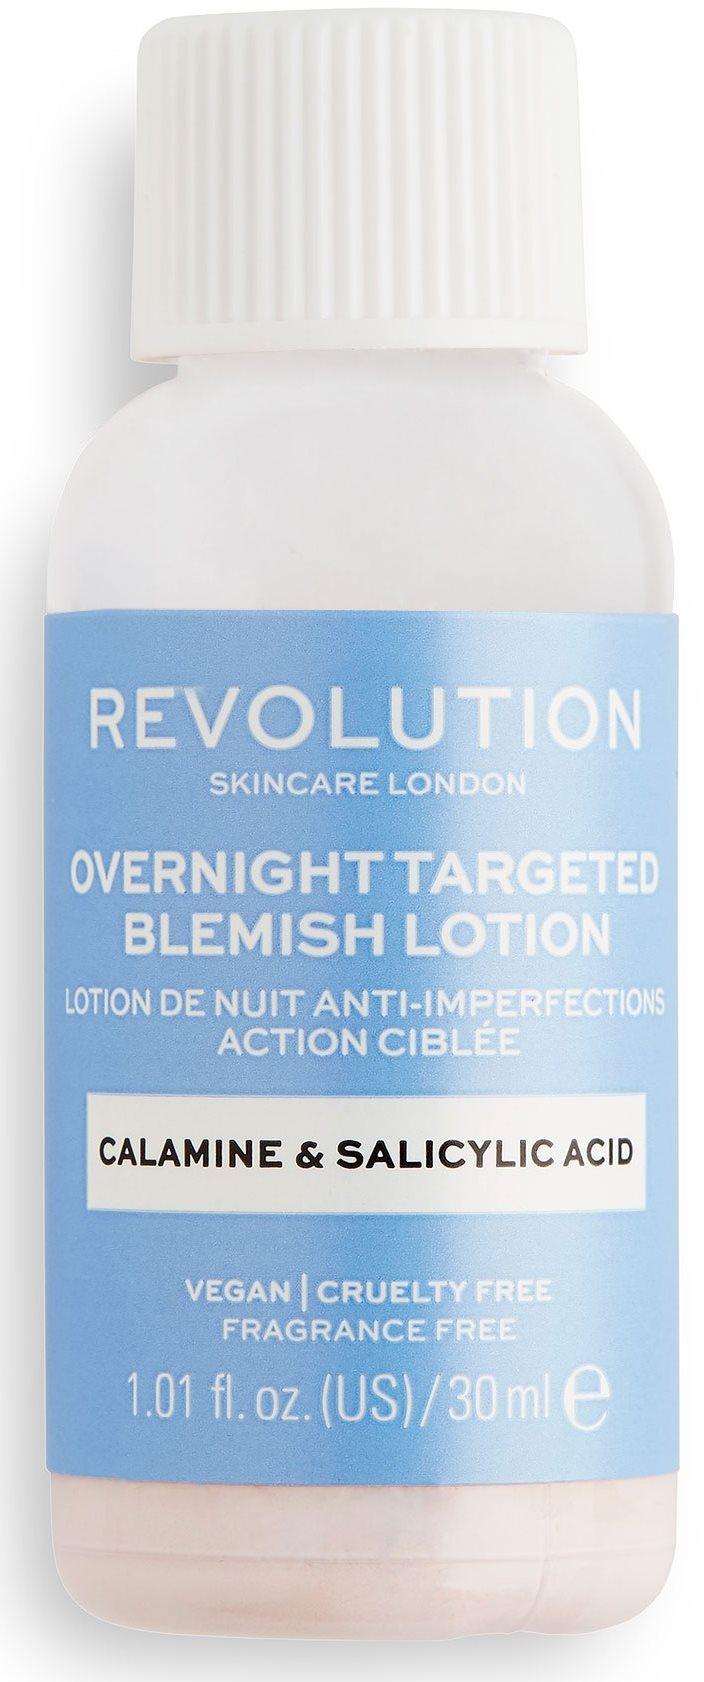 REVOLUTION SKINCARE Overnight Targeted Blemish Lotion 30 ml